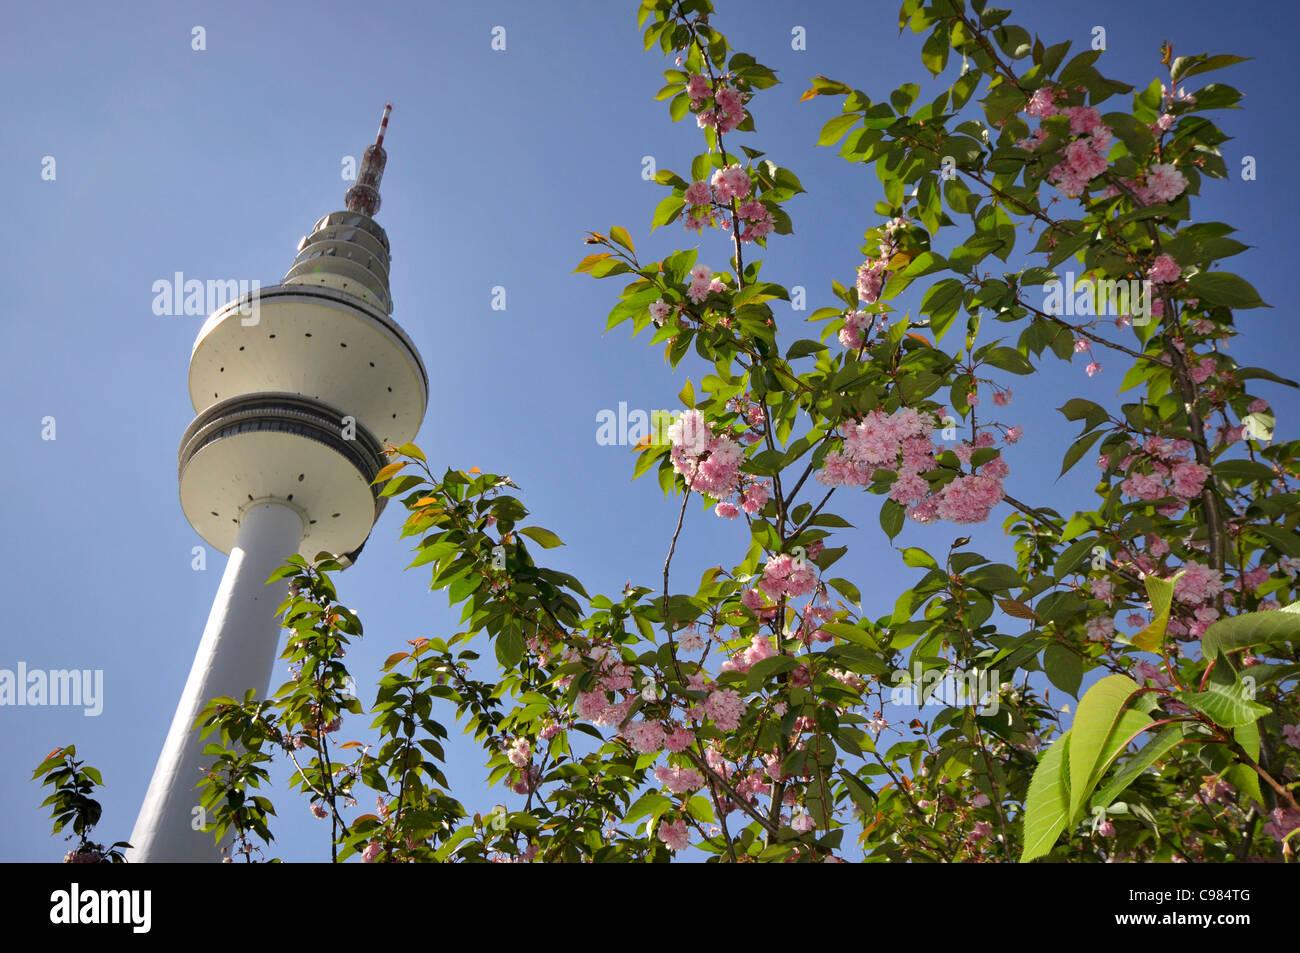 Spring meadow, Planten un Blomen Park, Communications Tower, Hamburg, Germany, Europe - Stock Image